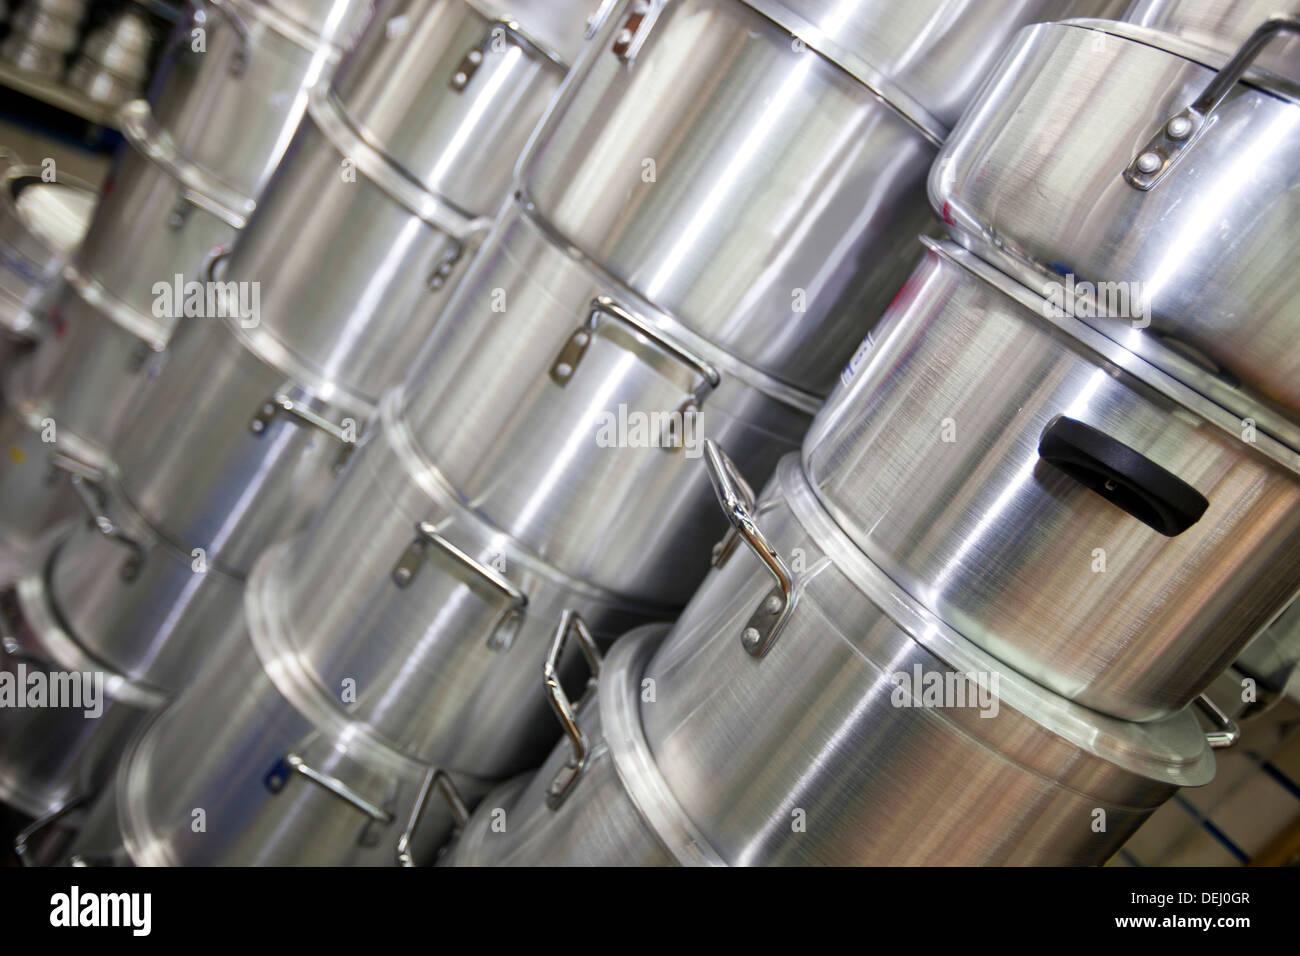 Stacked kitchen utensils supermarket - Stock Image